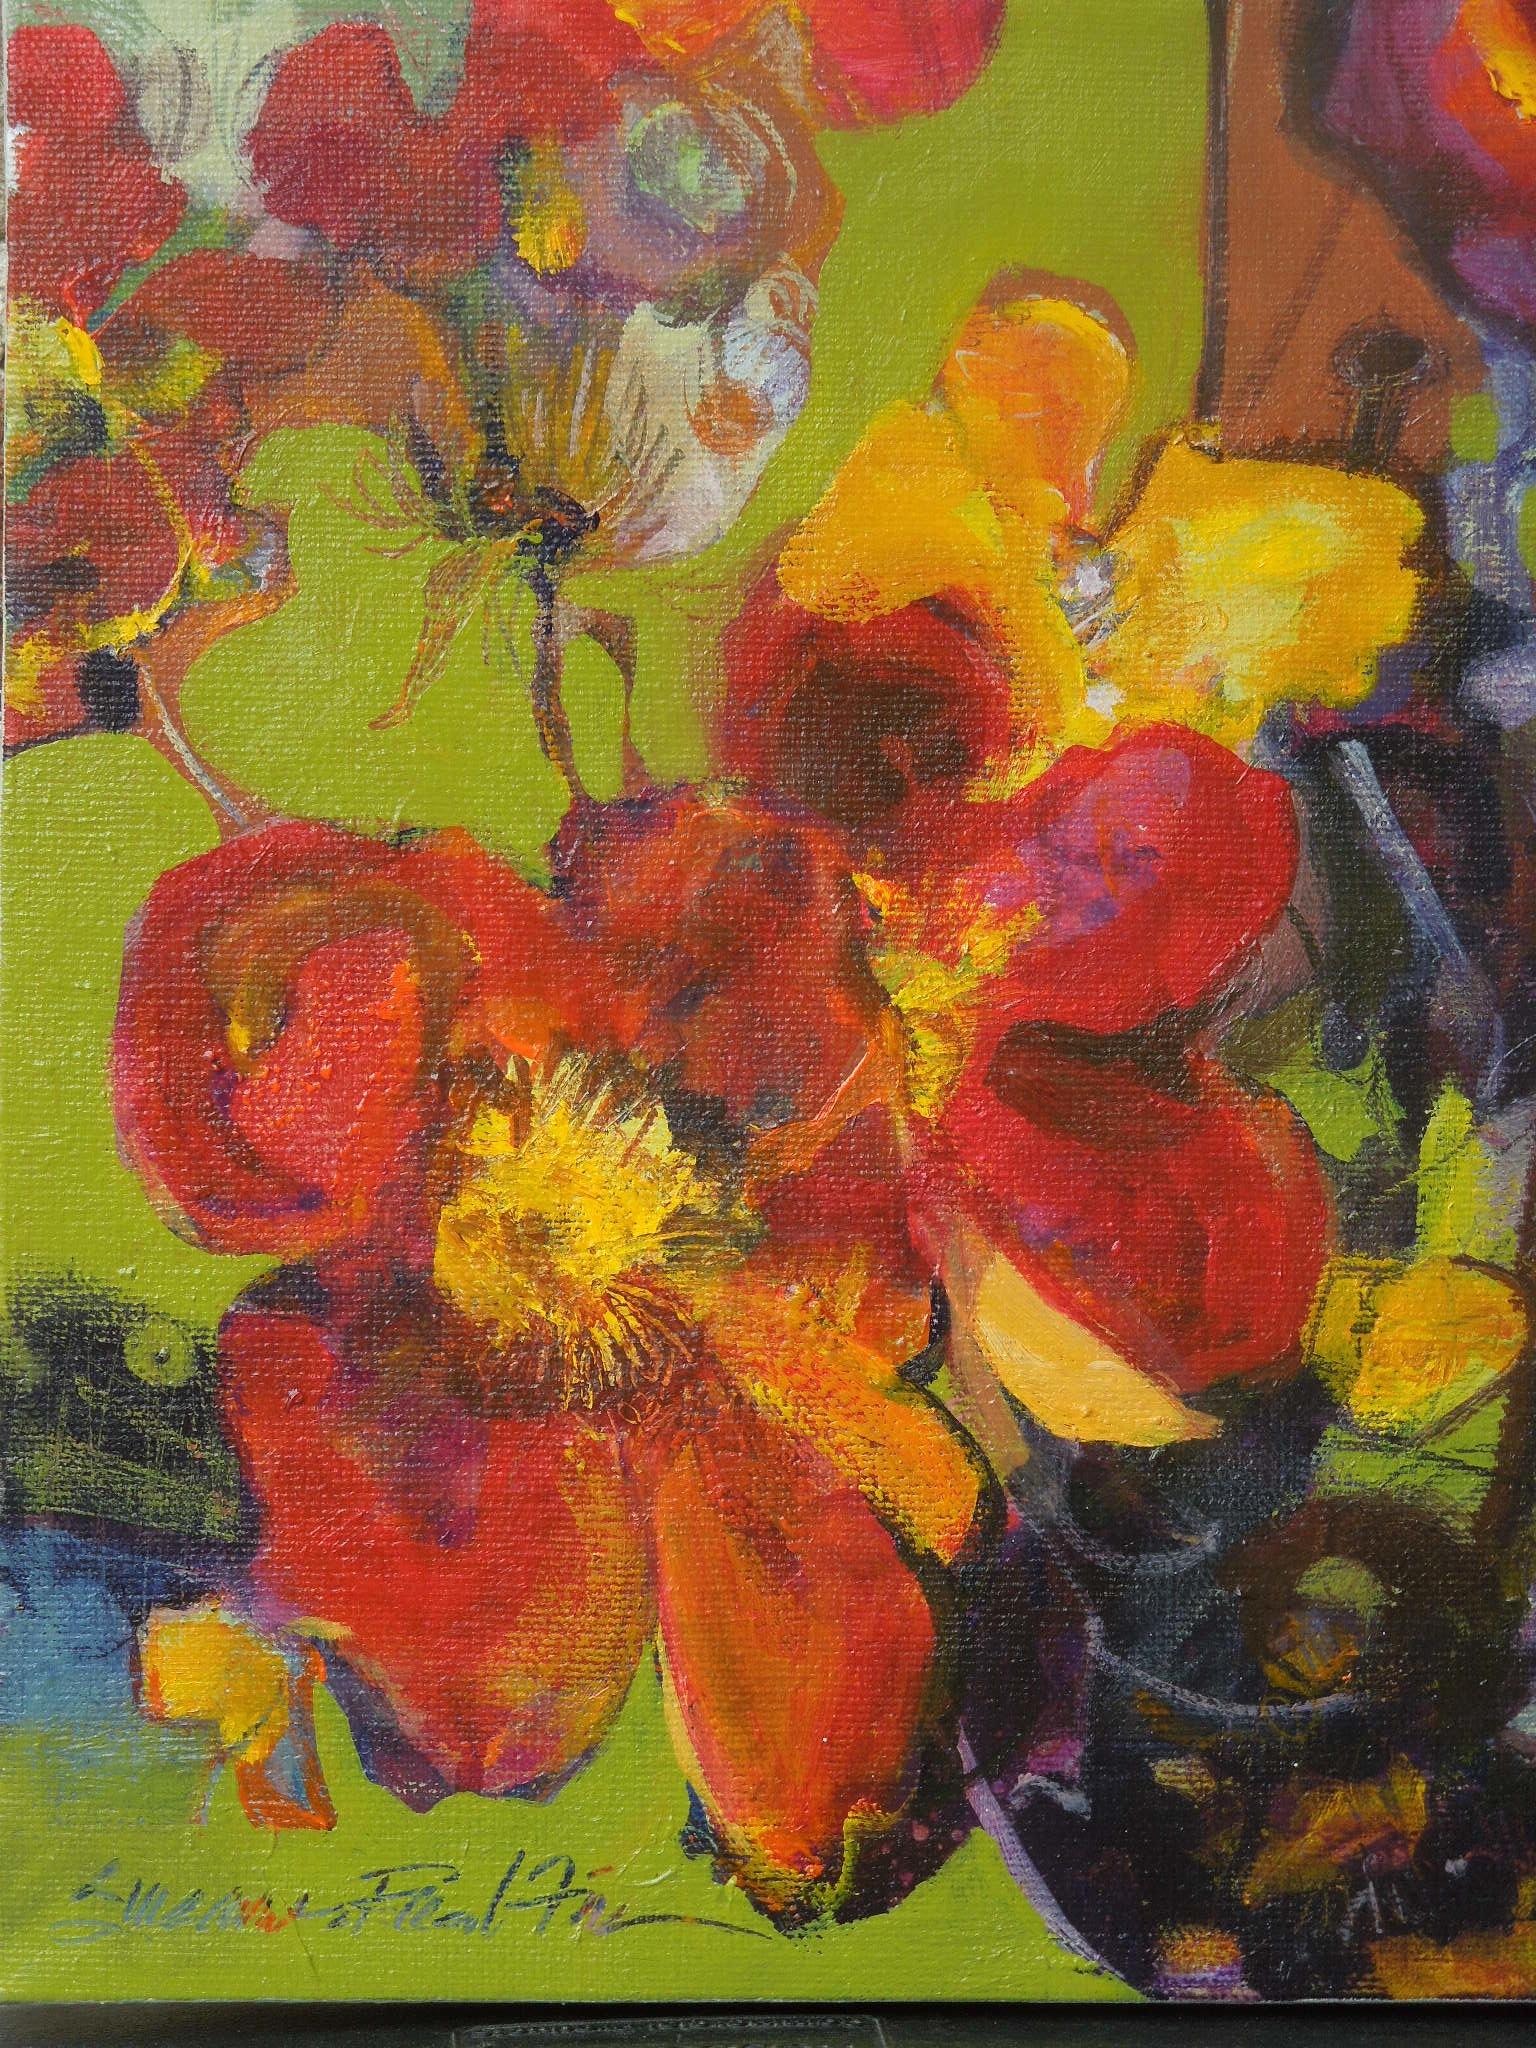 Spanish Roses (Copper Roses)